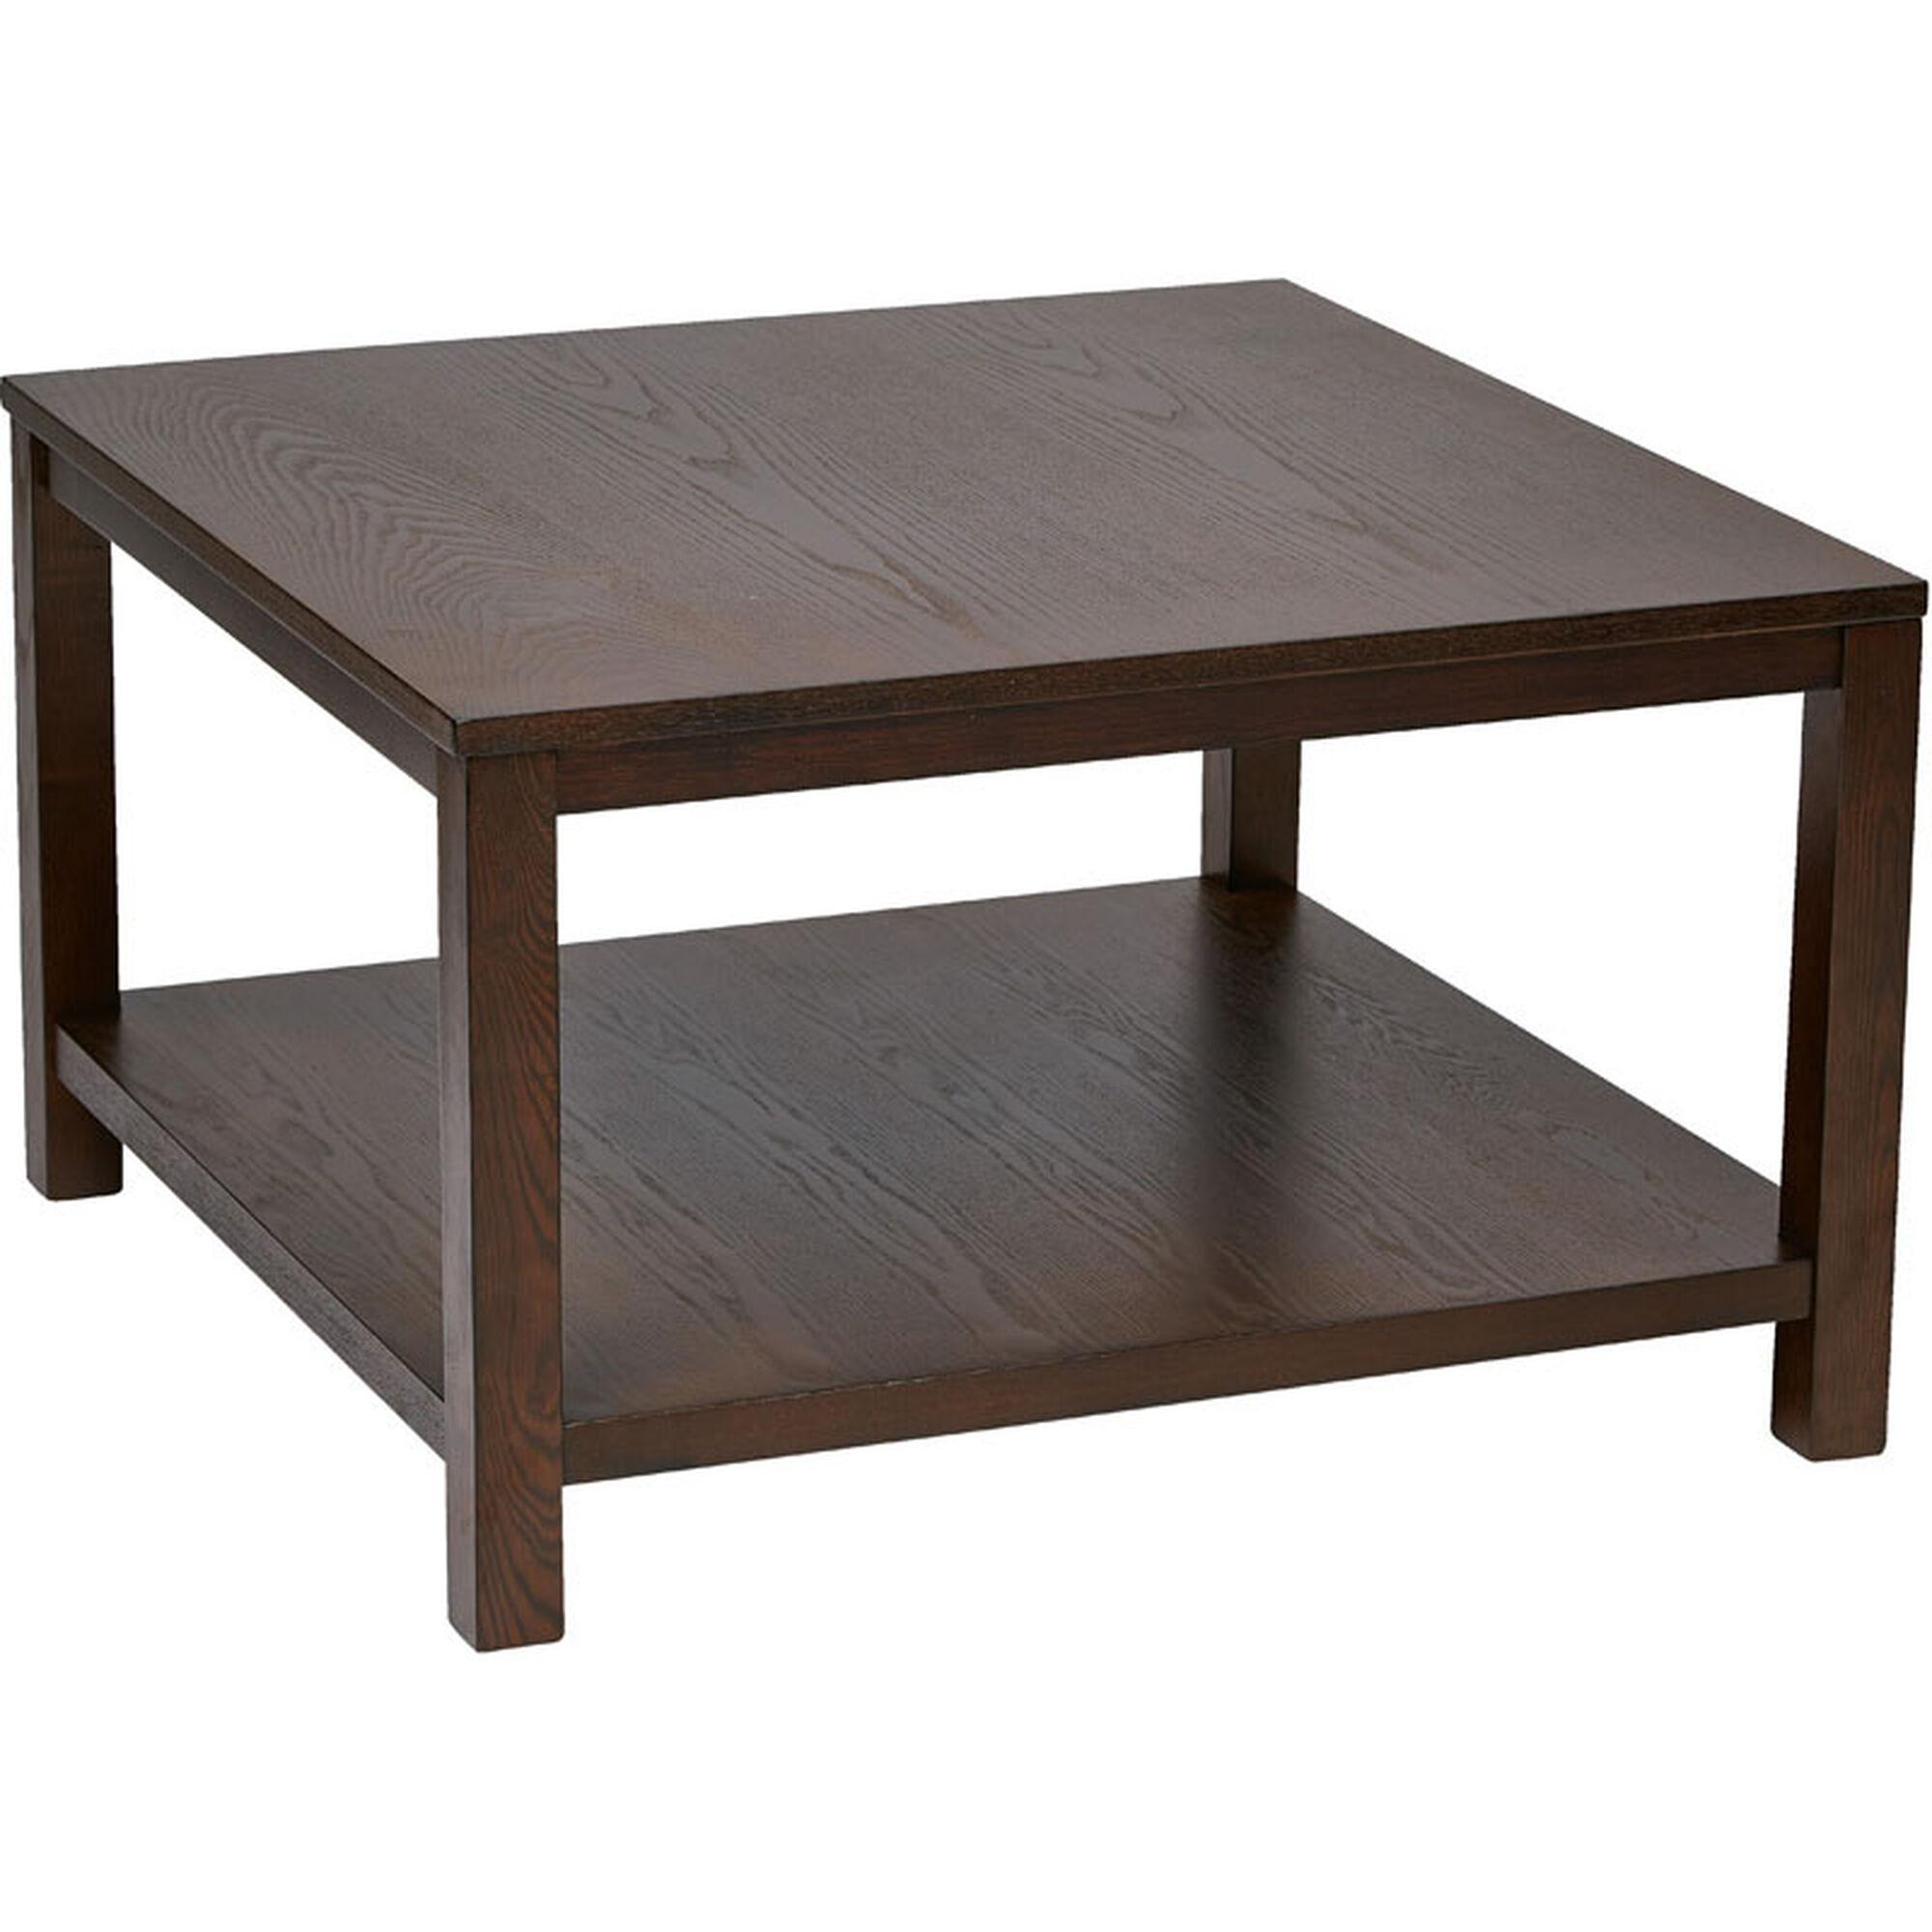 Ave Six Merge Square Coffee Table Mrg12sr1 Esp